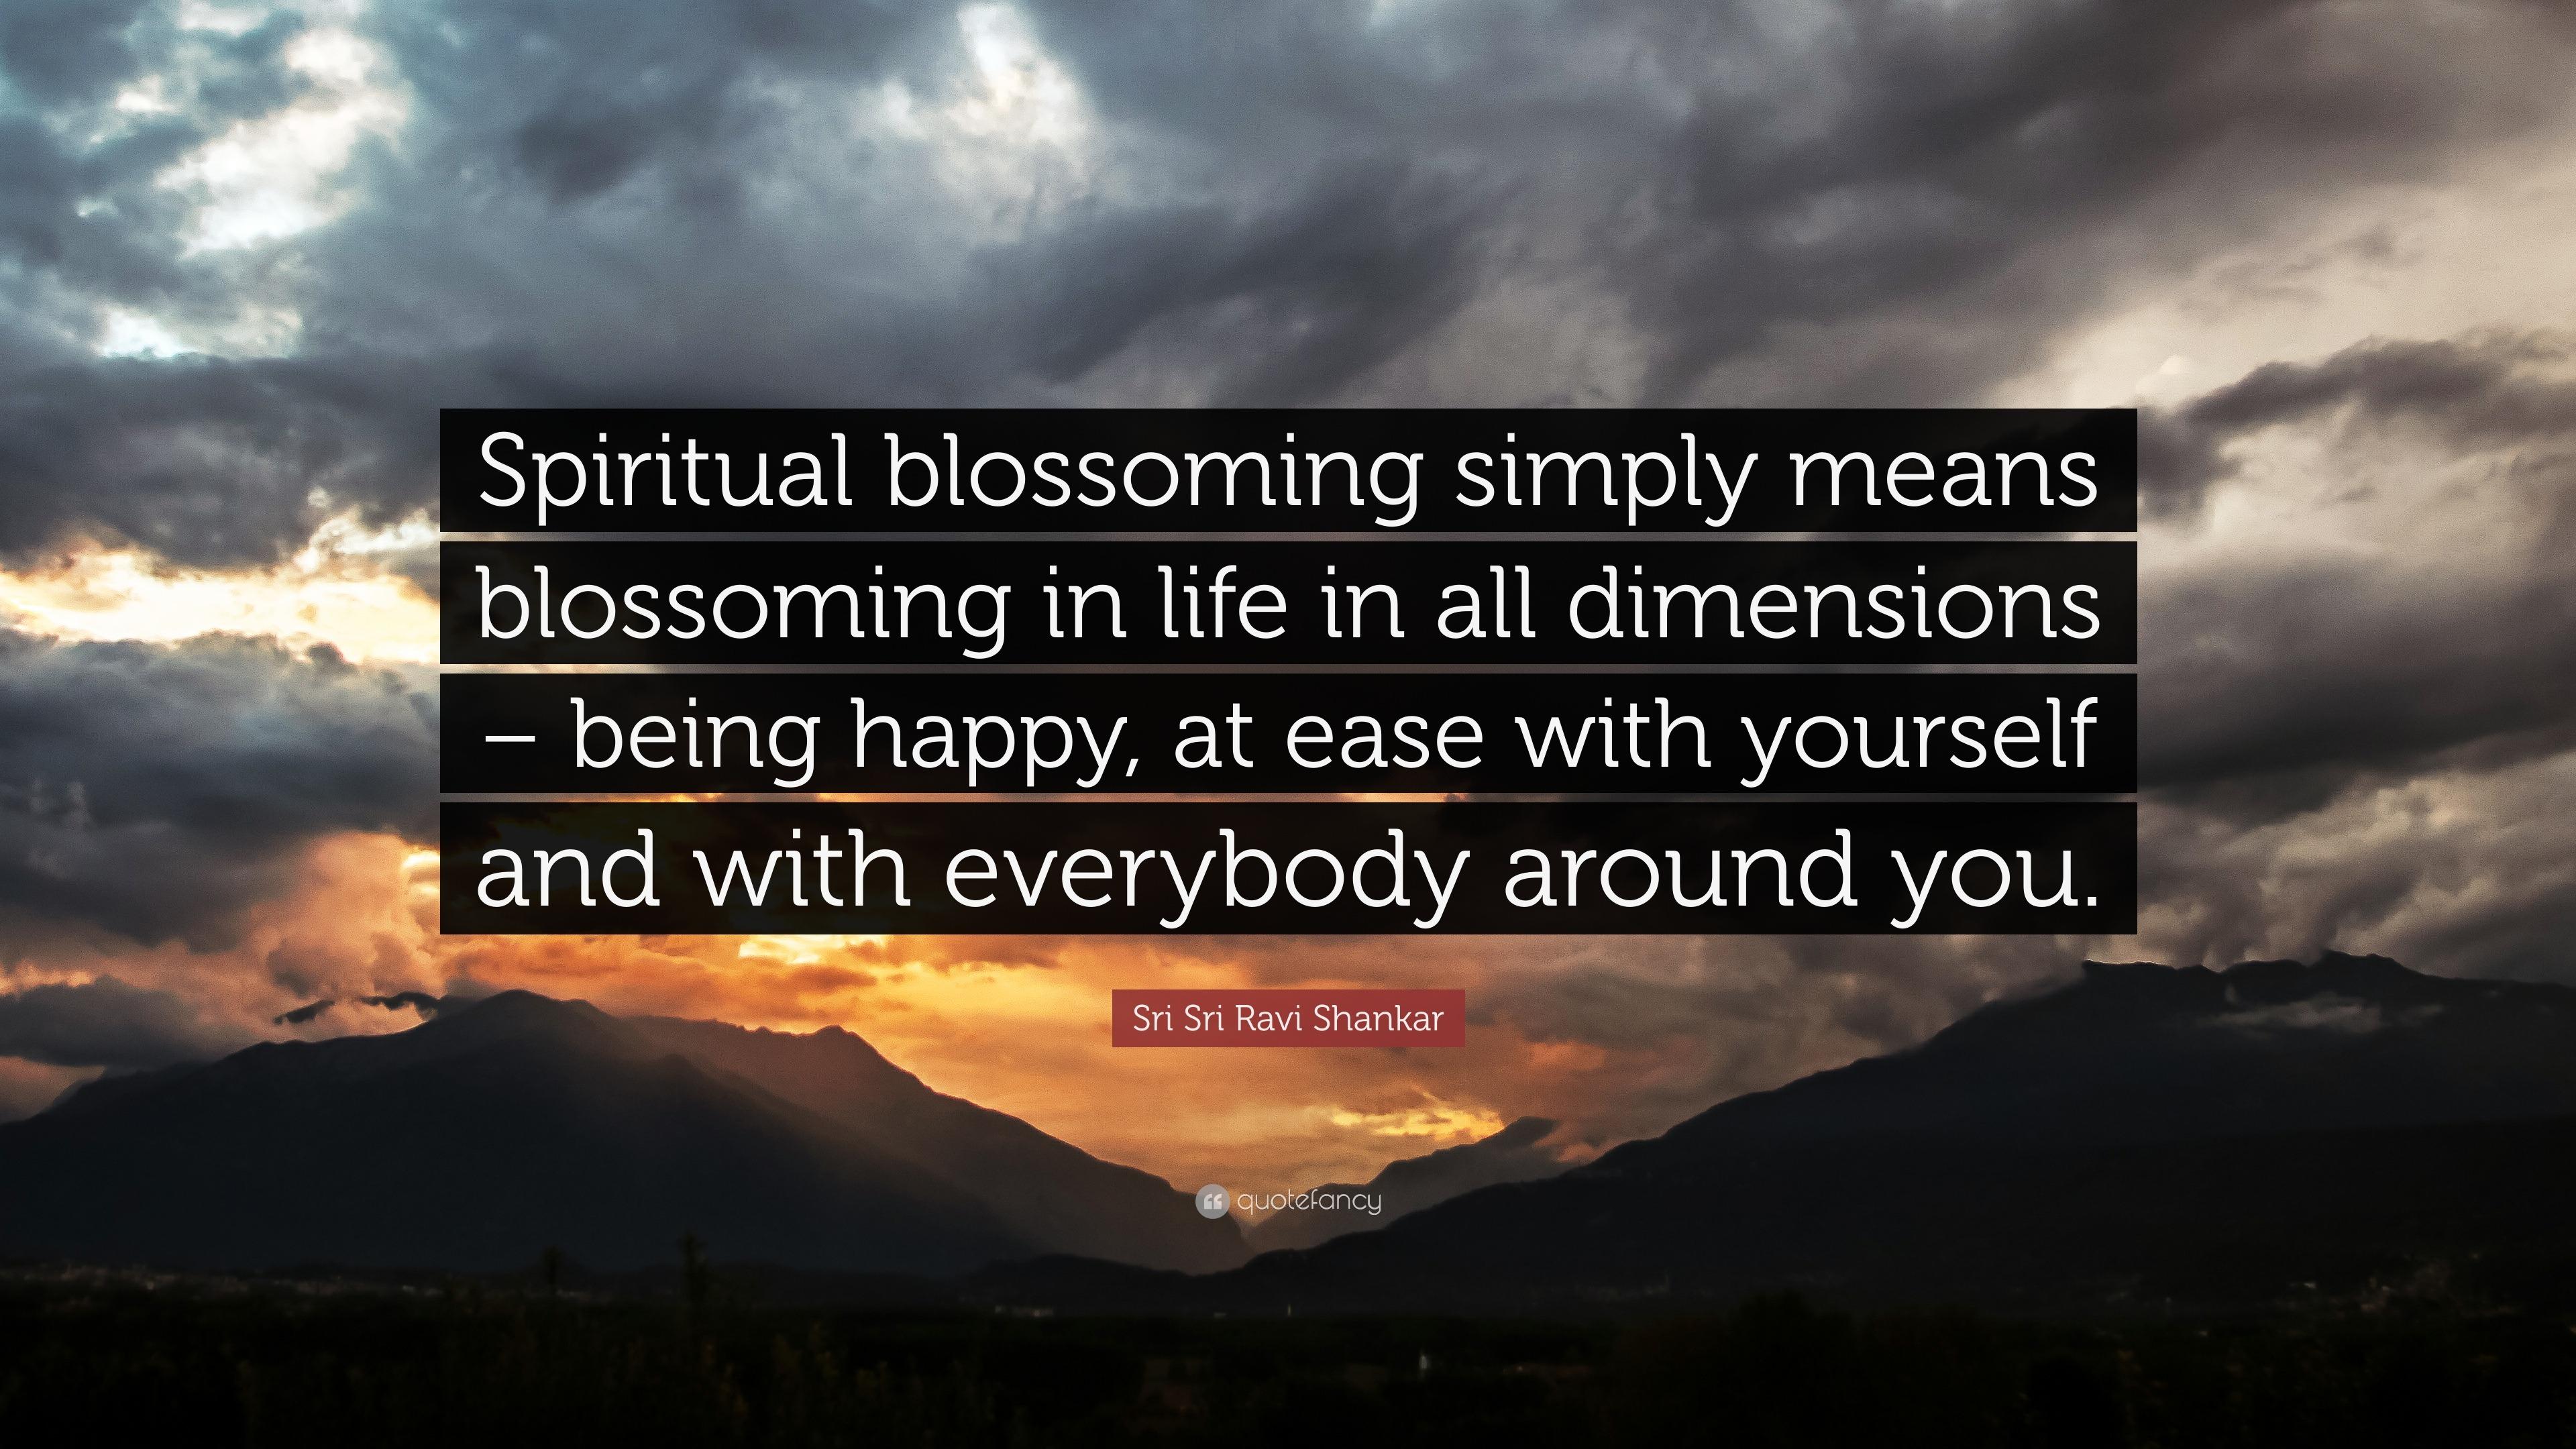 Sri Sri Ravi Shankar Quote Spiritual Blossoming Simply Means